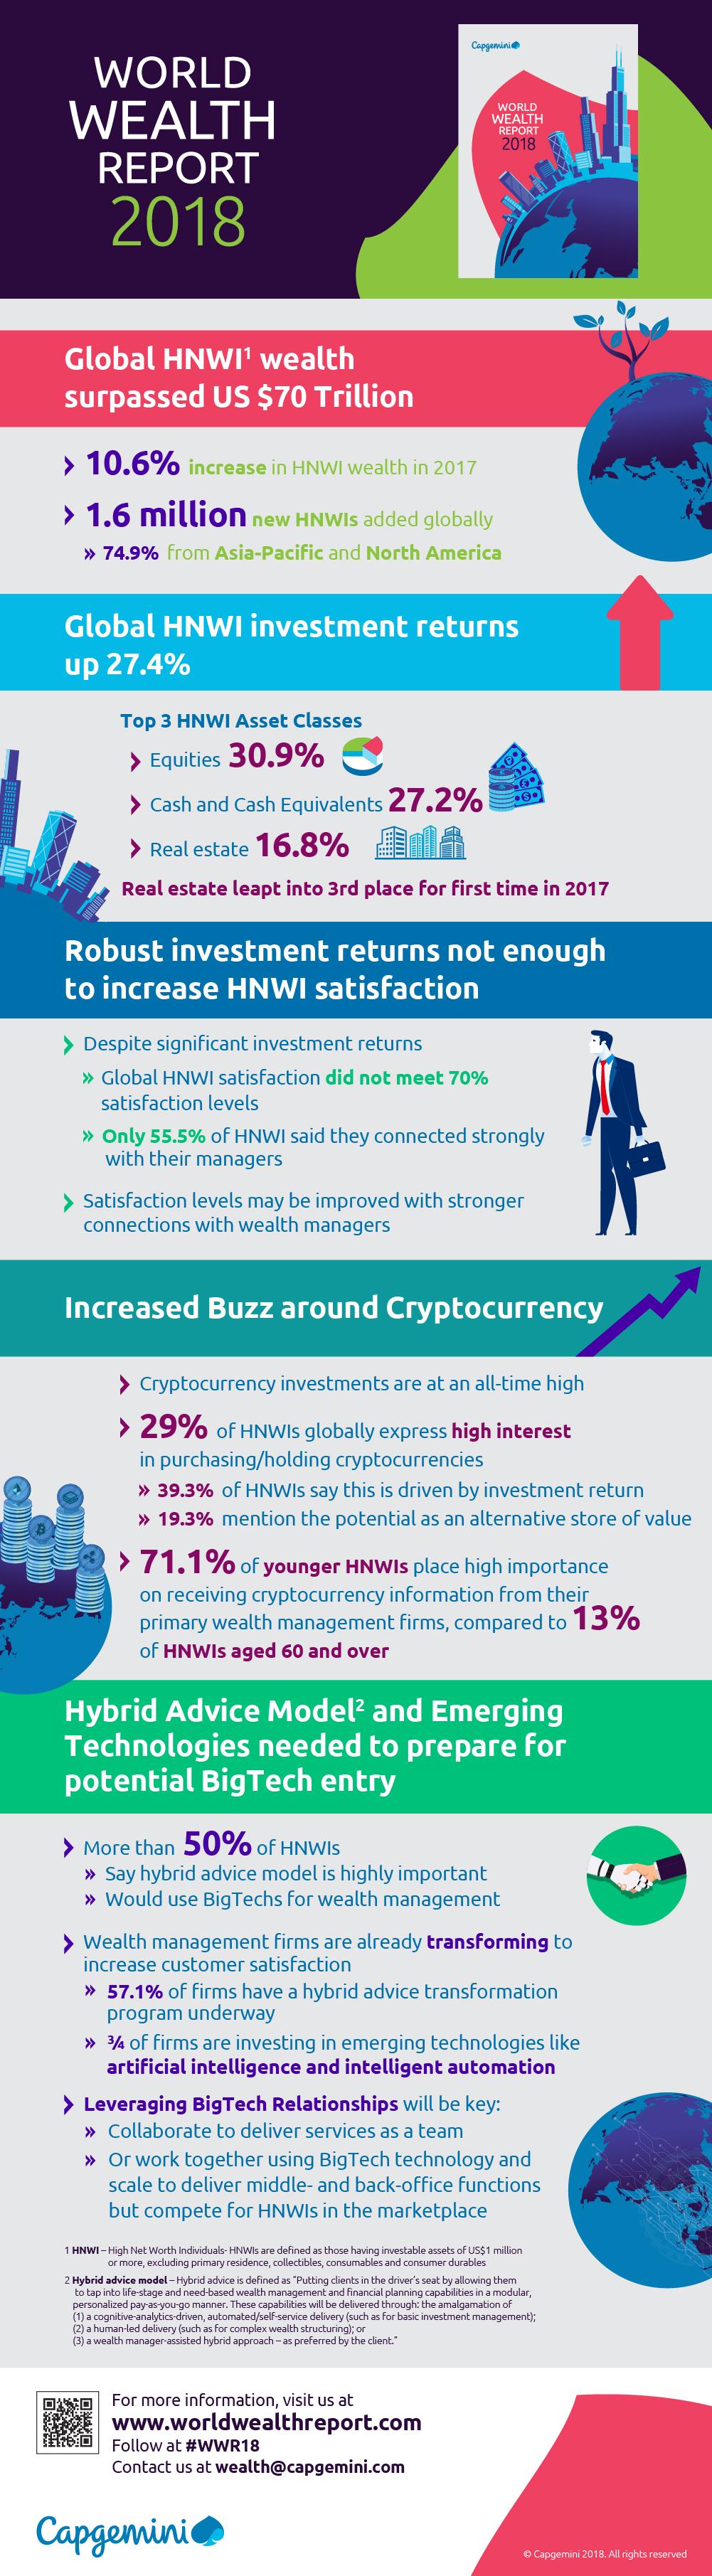 Infográfico World Wealth Report 2018